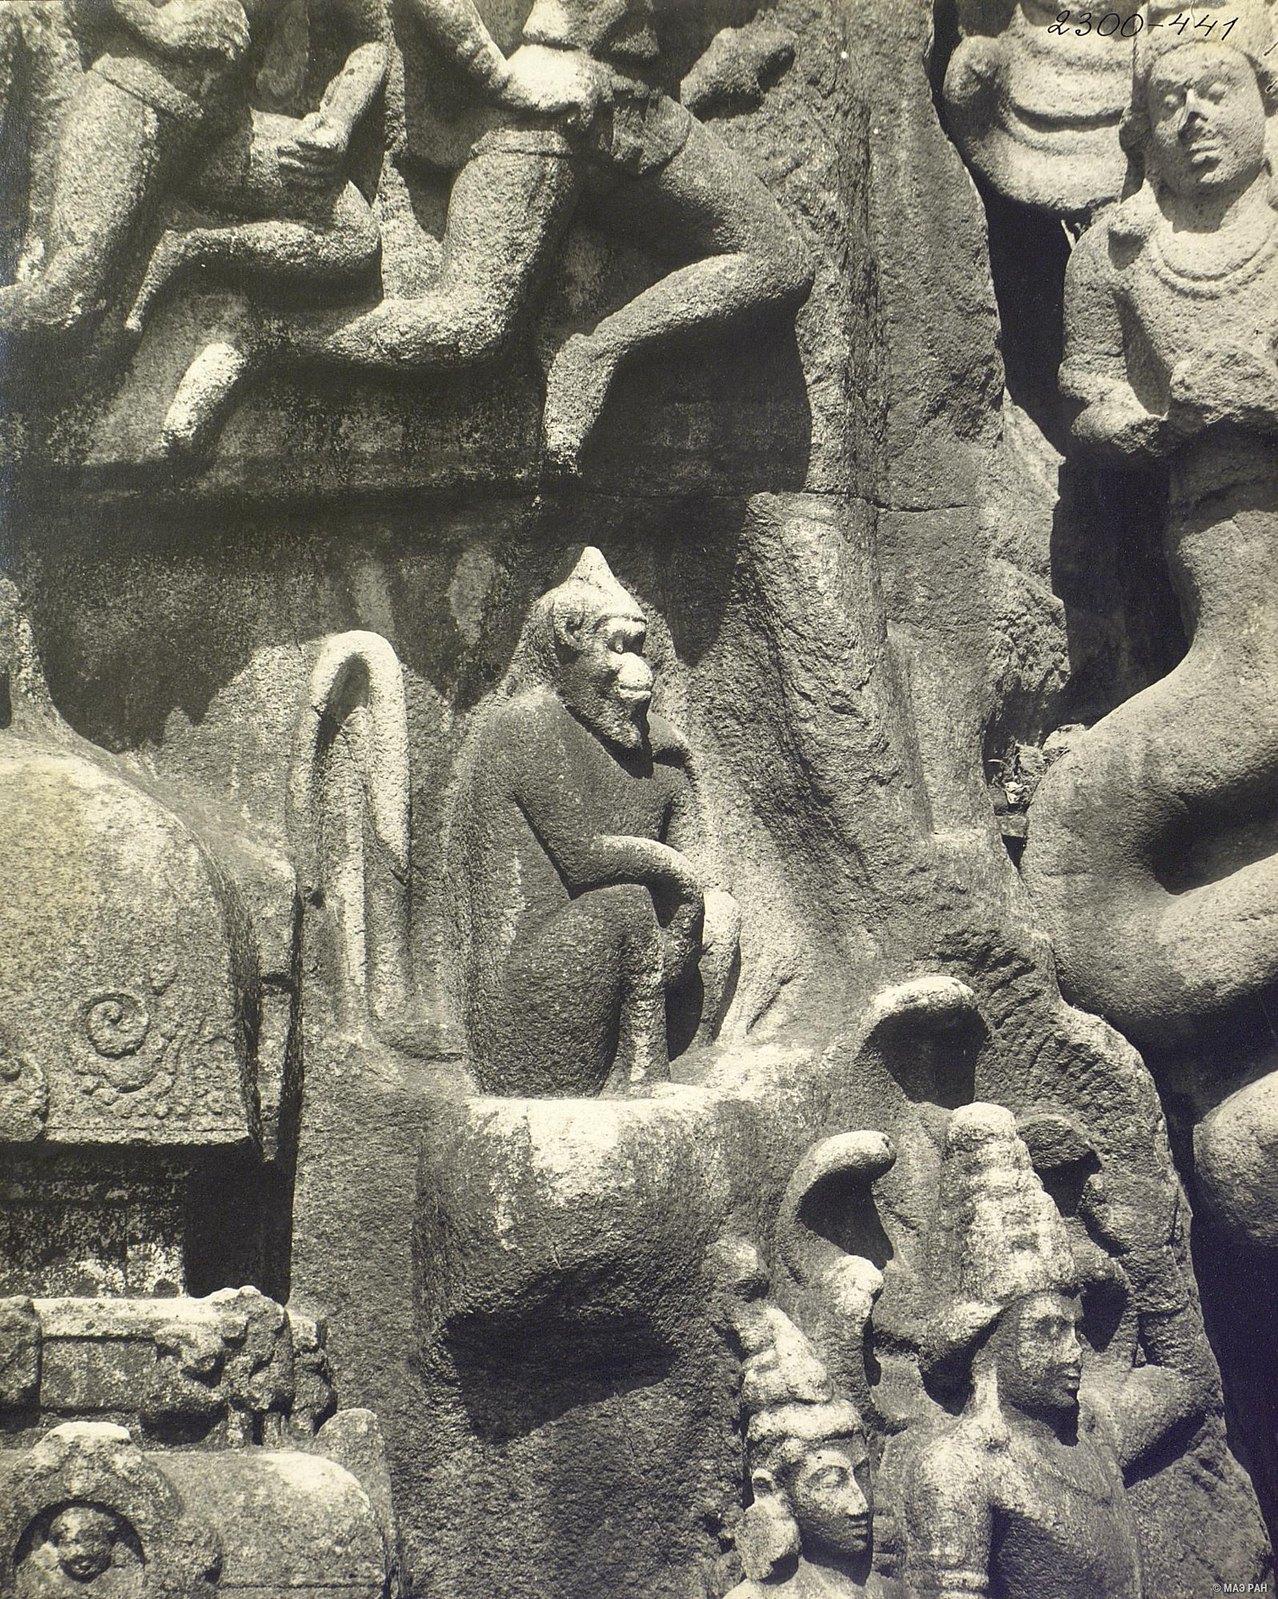 Мамаллапур (деталь рельефа «Обезьяна»)